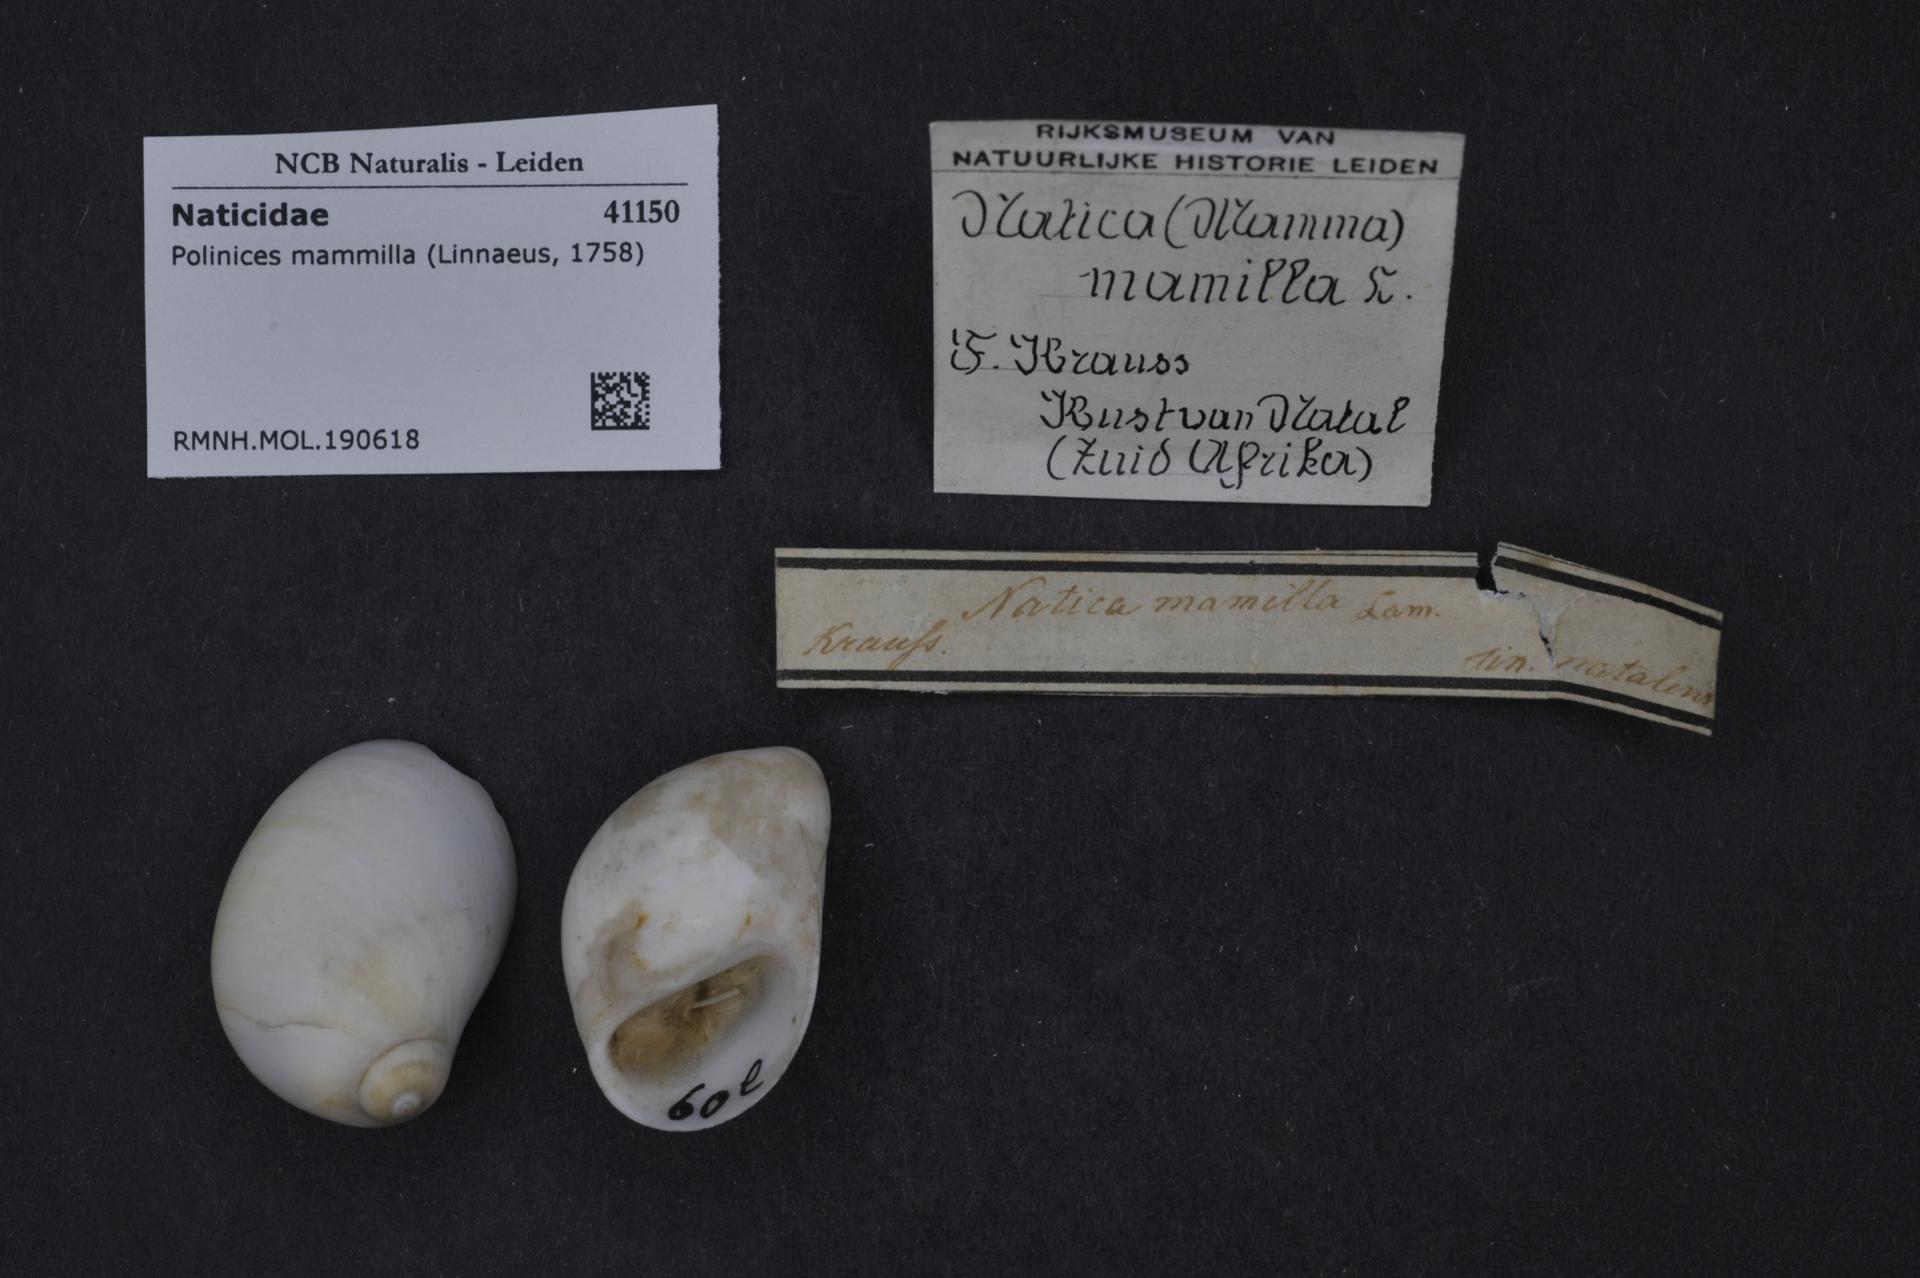 RMNH.MOL.190618 | Polinices mammilla (Linnaeus, 1758)